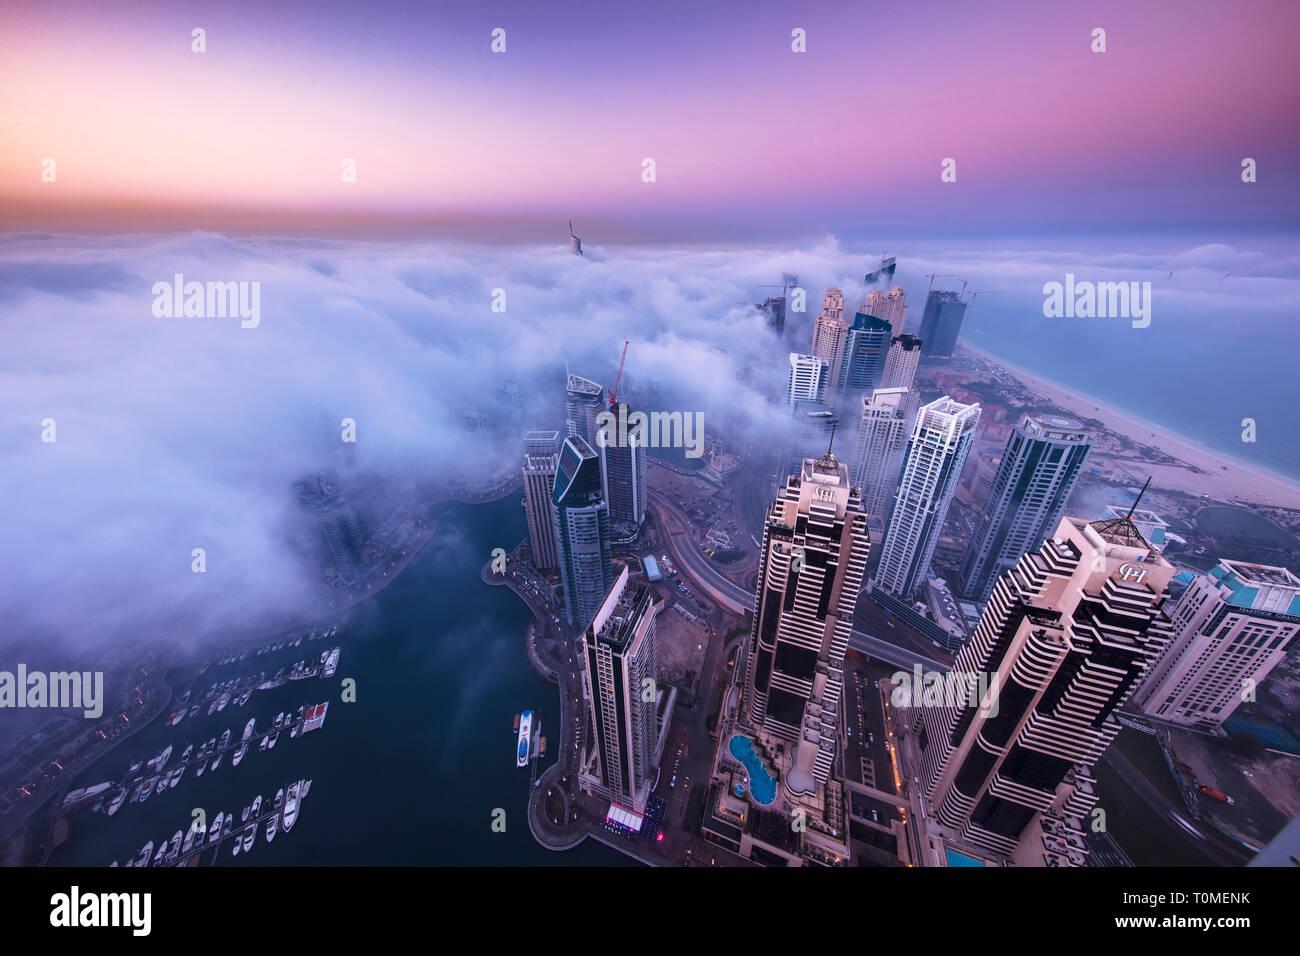 Un matin brumeux à Marina, Dubaï Banque D'Images